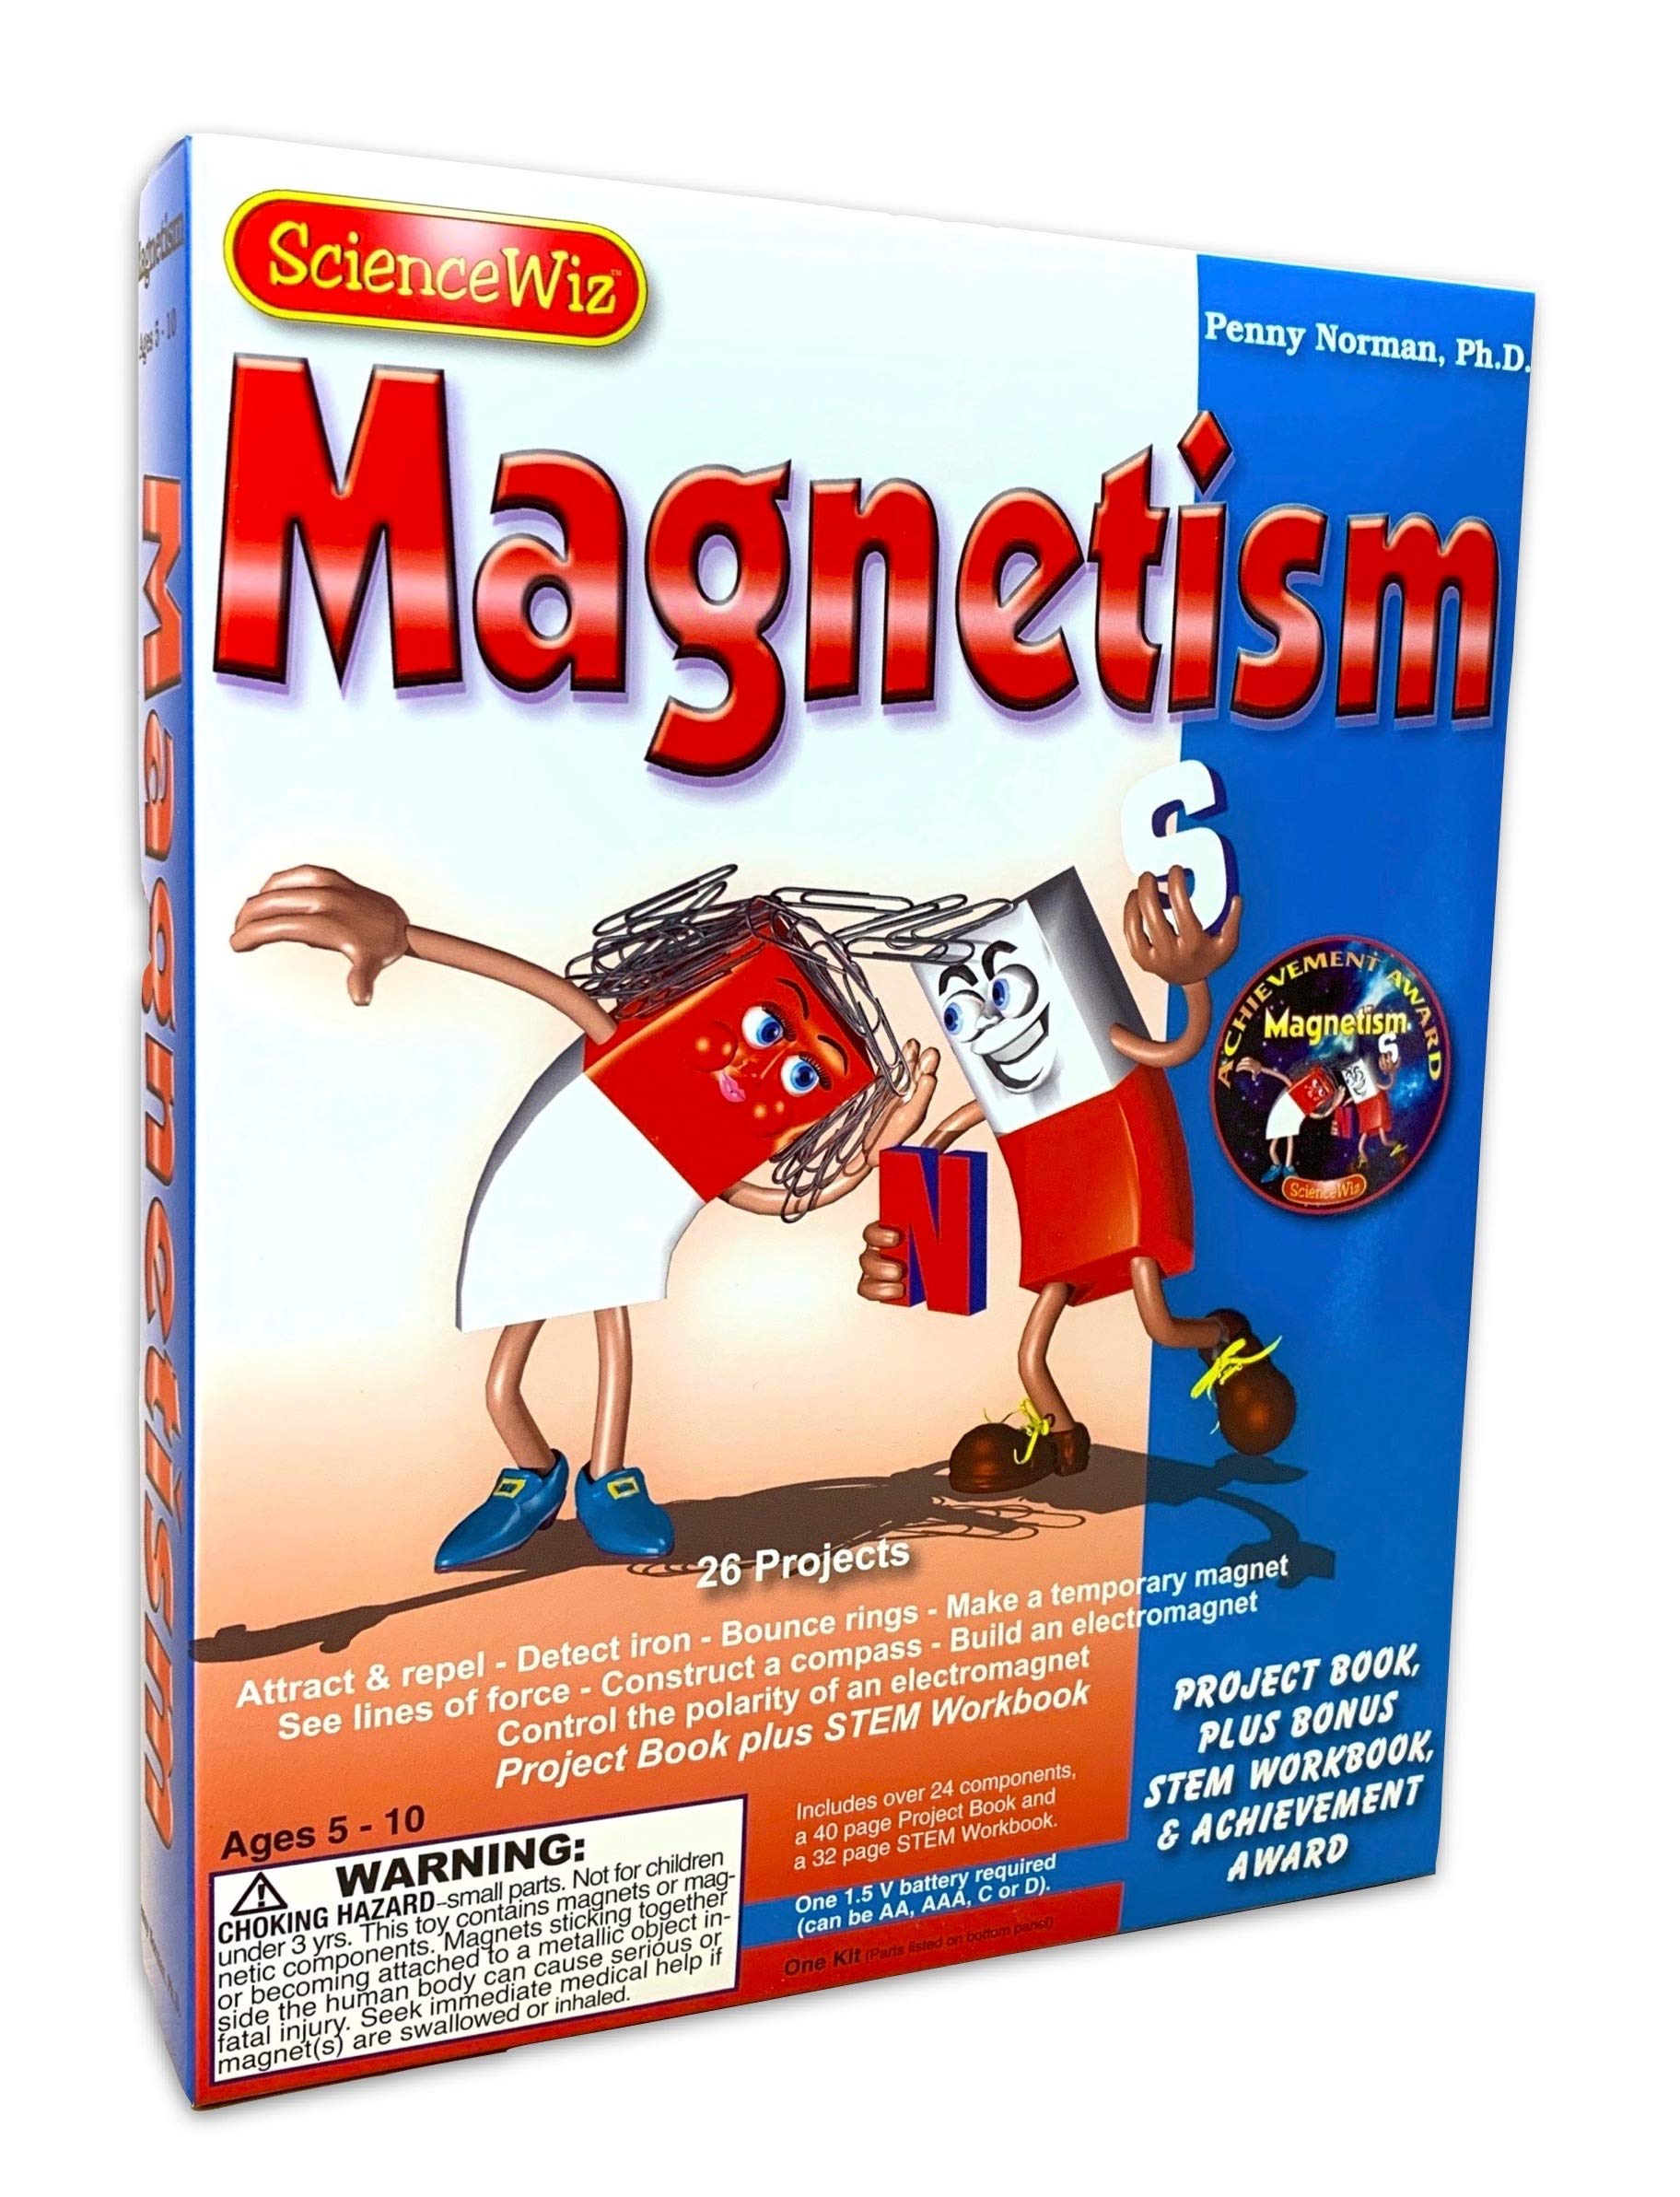 Science Wiz Magnetism with Workbook